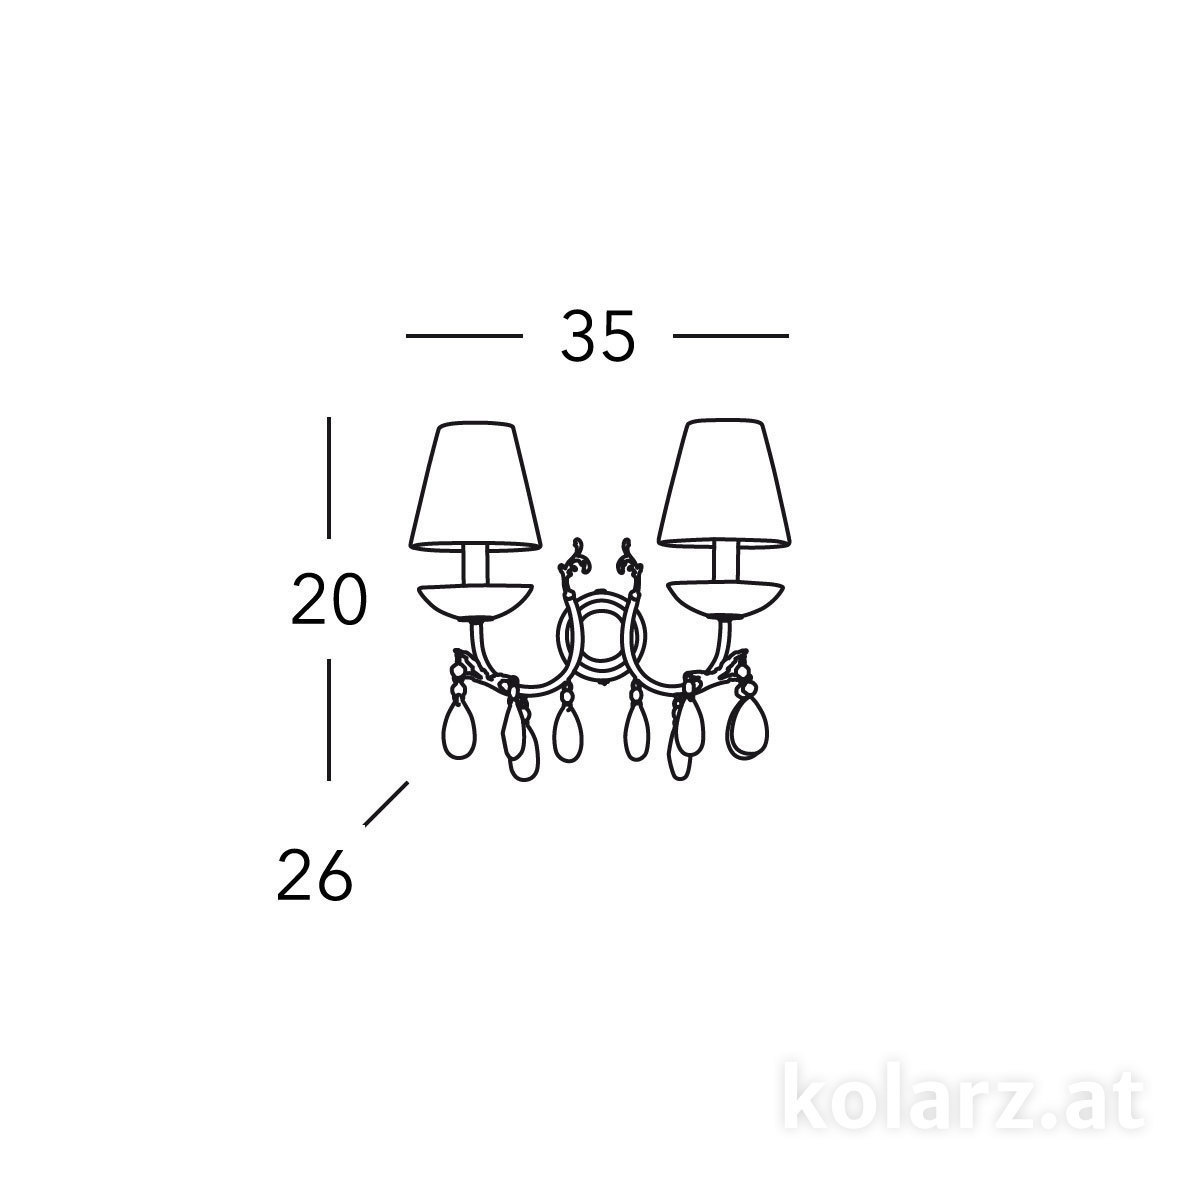 3003-62-3-KoT__aq21-s1.jpg